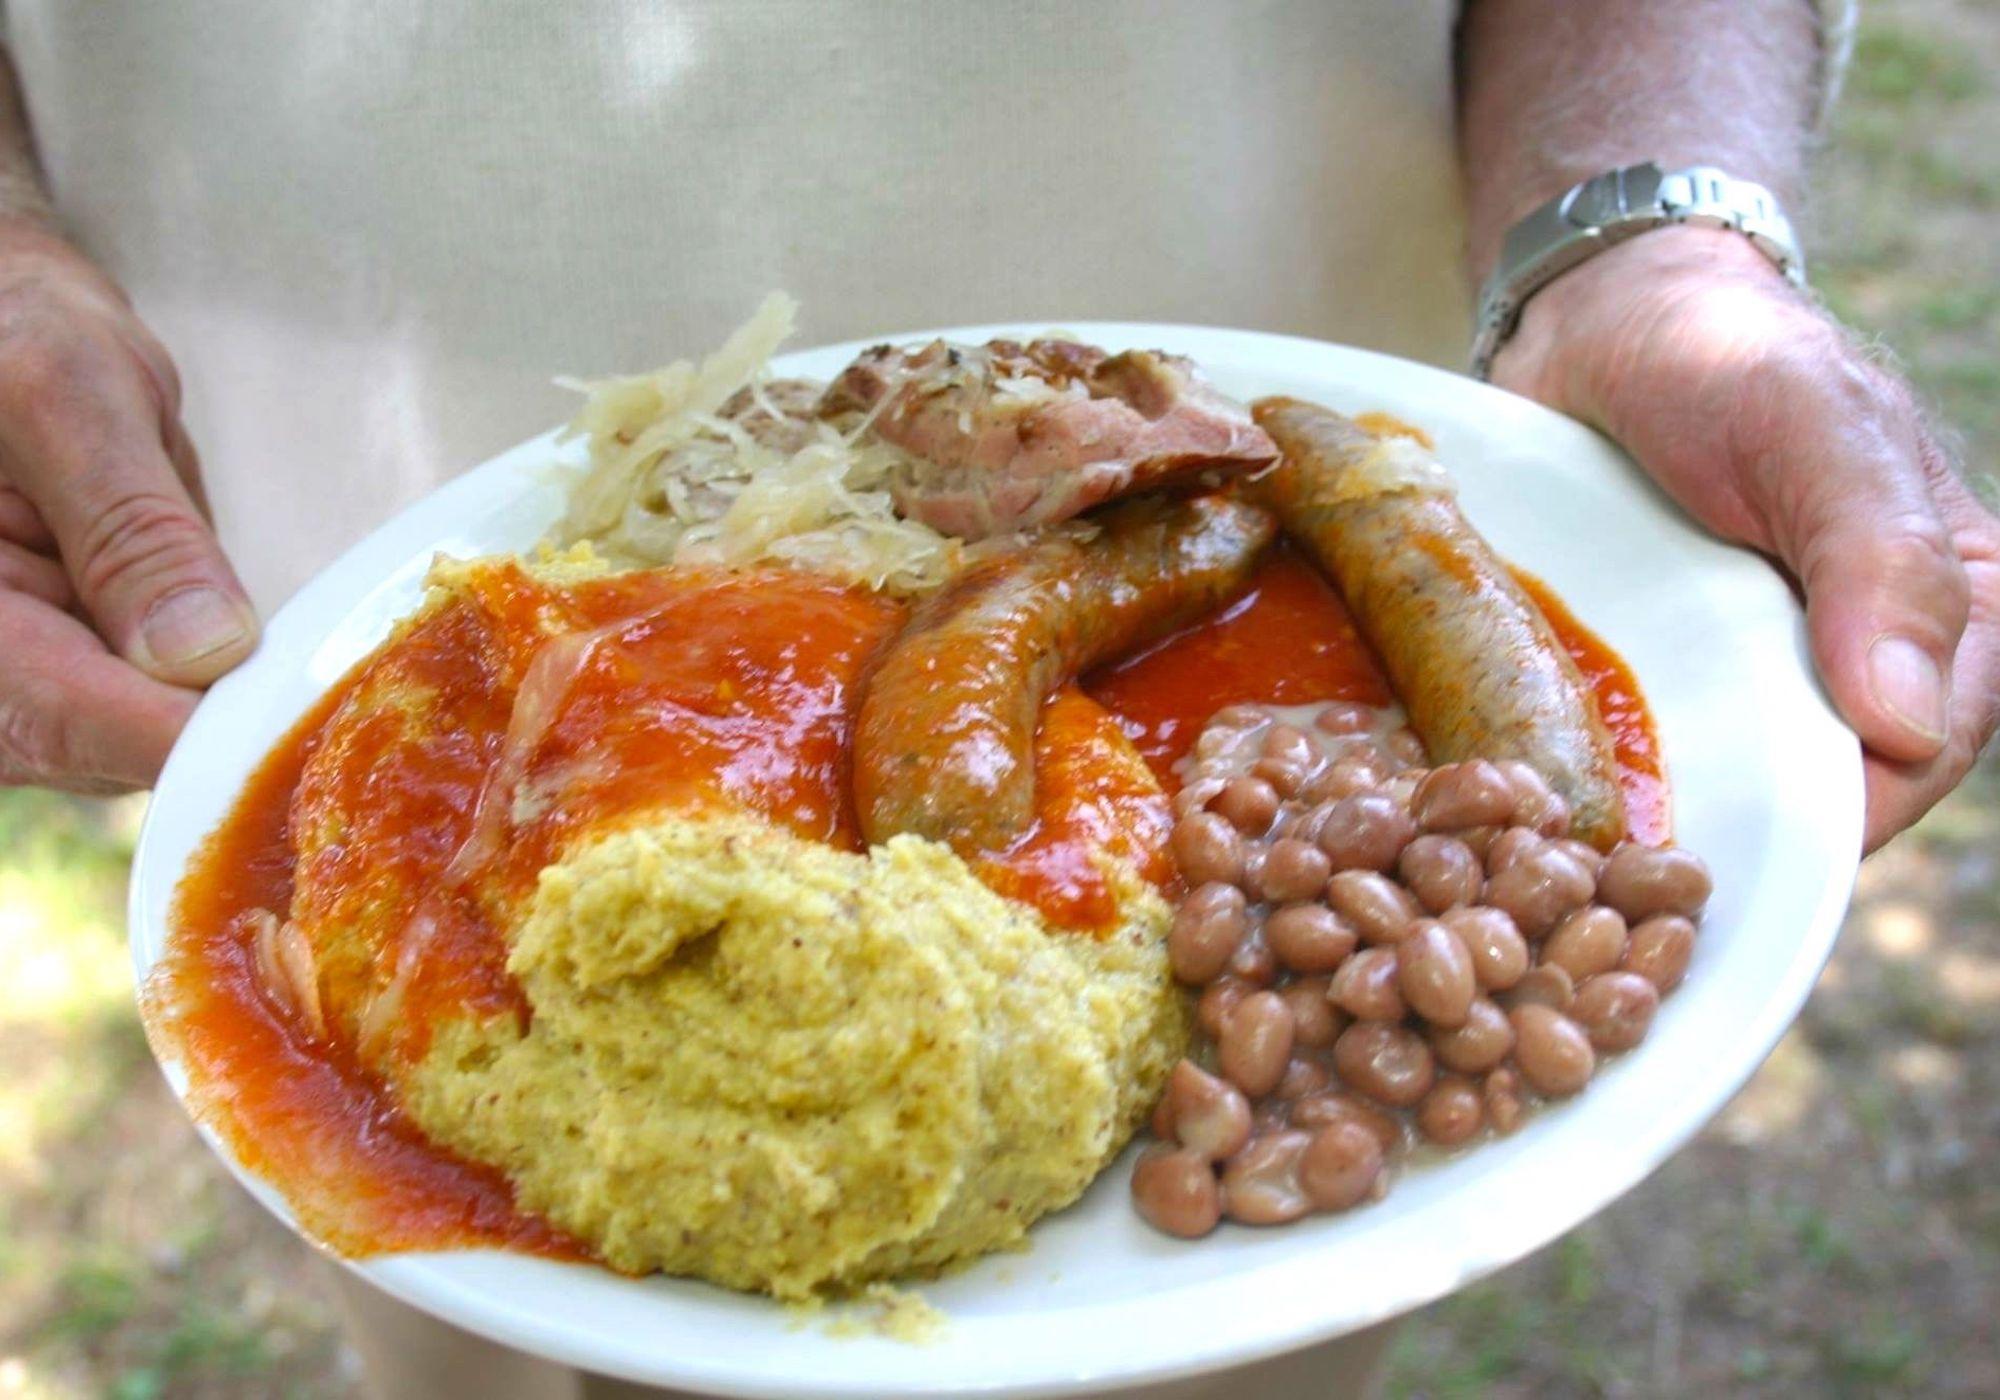 malga-di-coredo-mangiare in malga-polenta